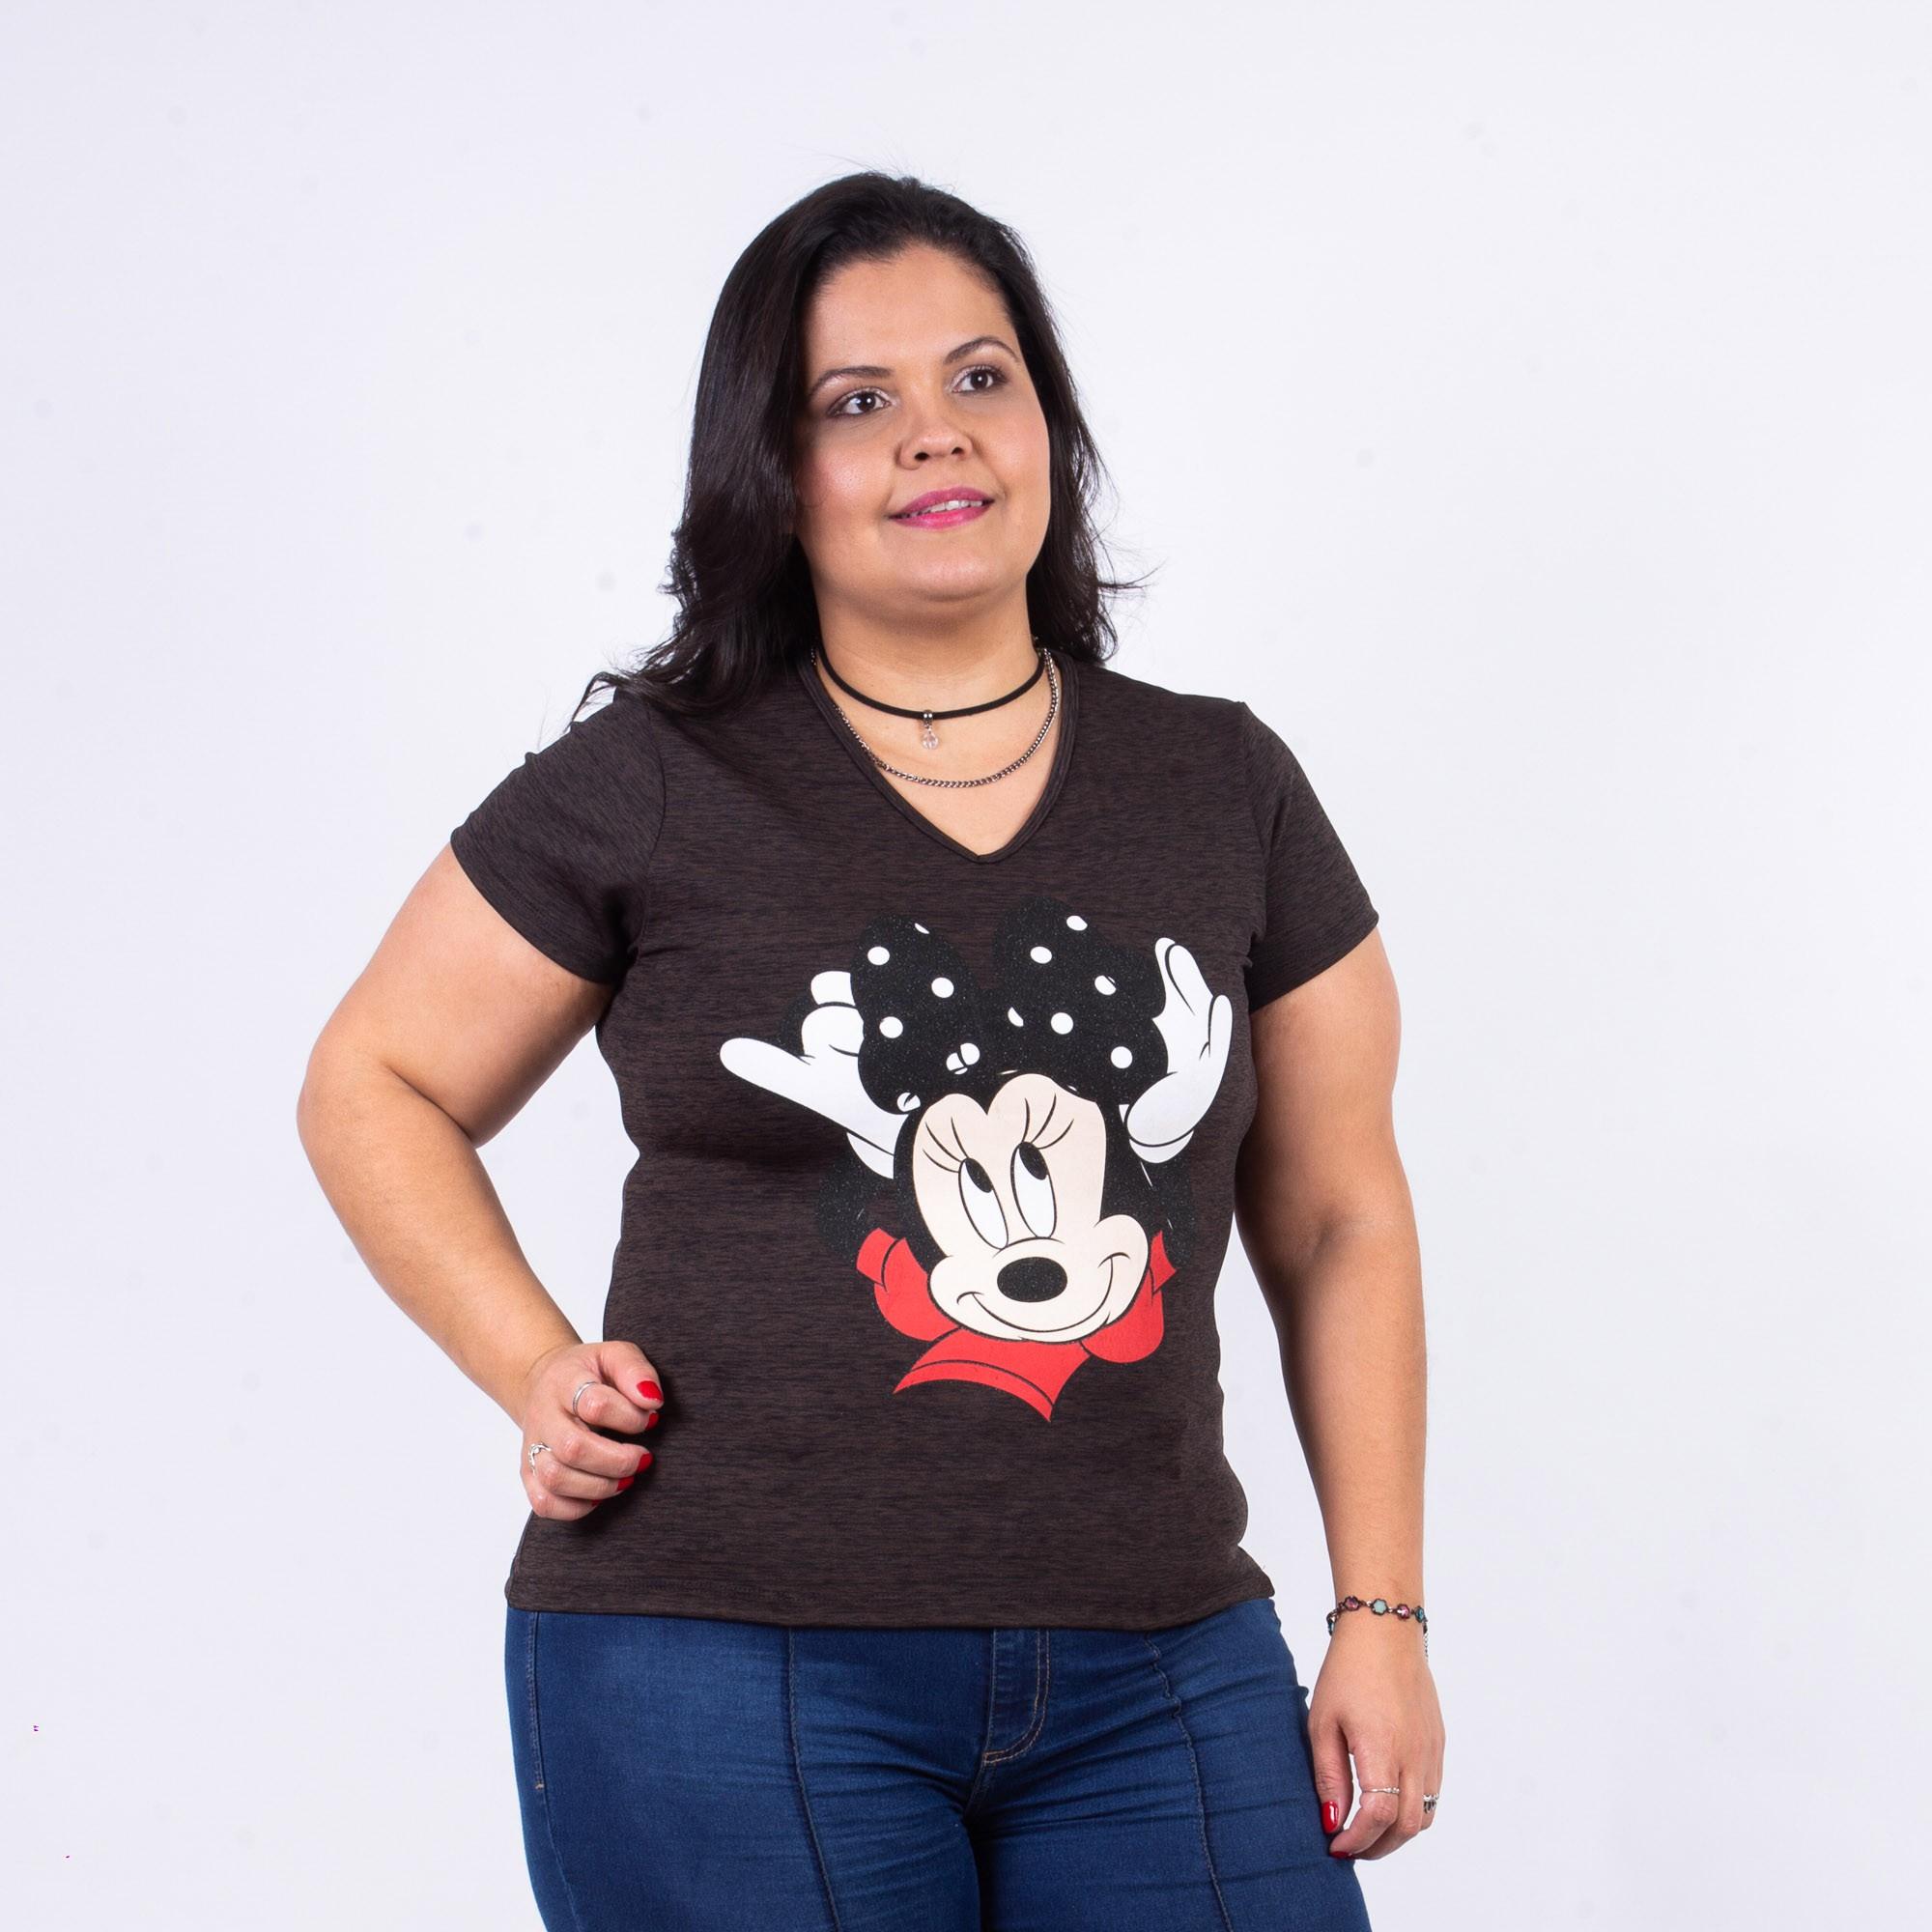 T-shirt Feminina Estampada Helanca